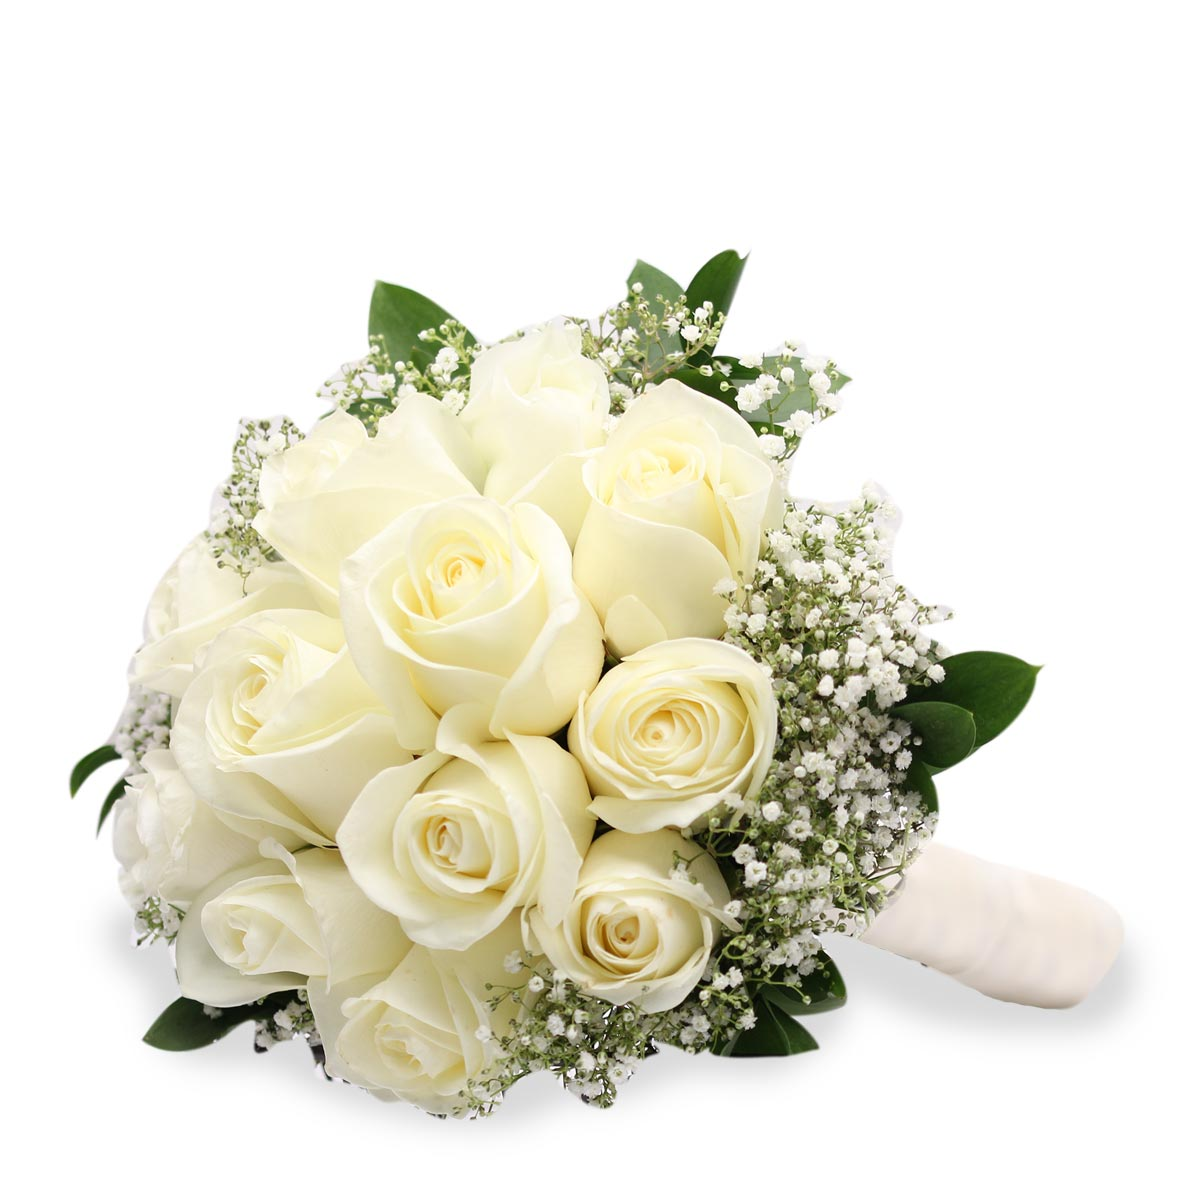 wb1635-white-bridal-bouquet7e64a7a8350a62b6a920ff0000e4902b